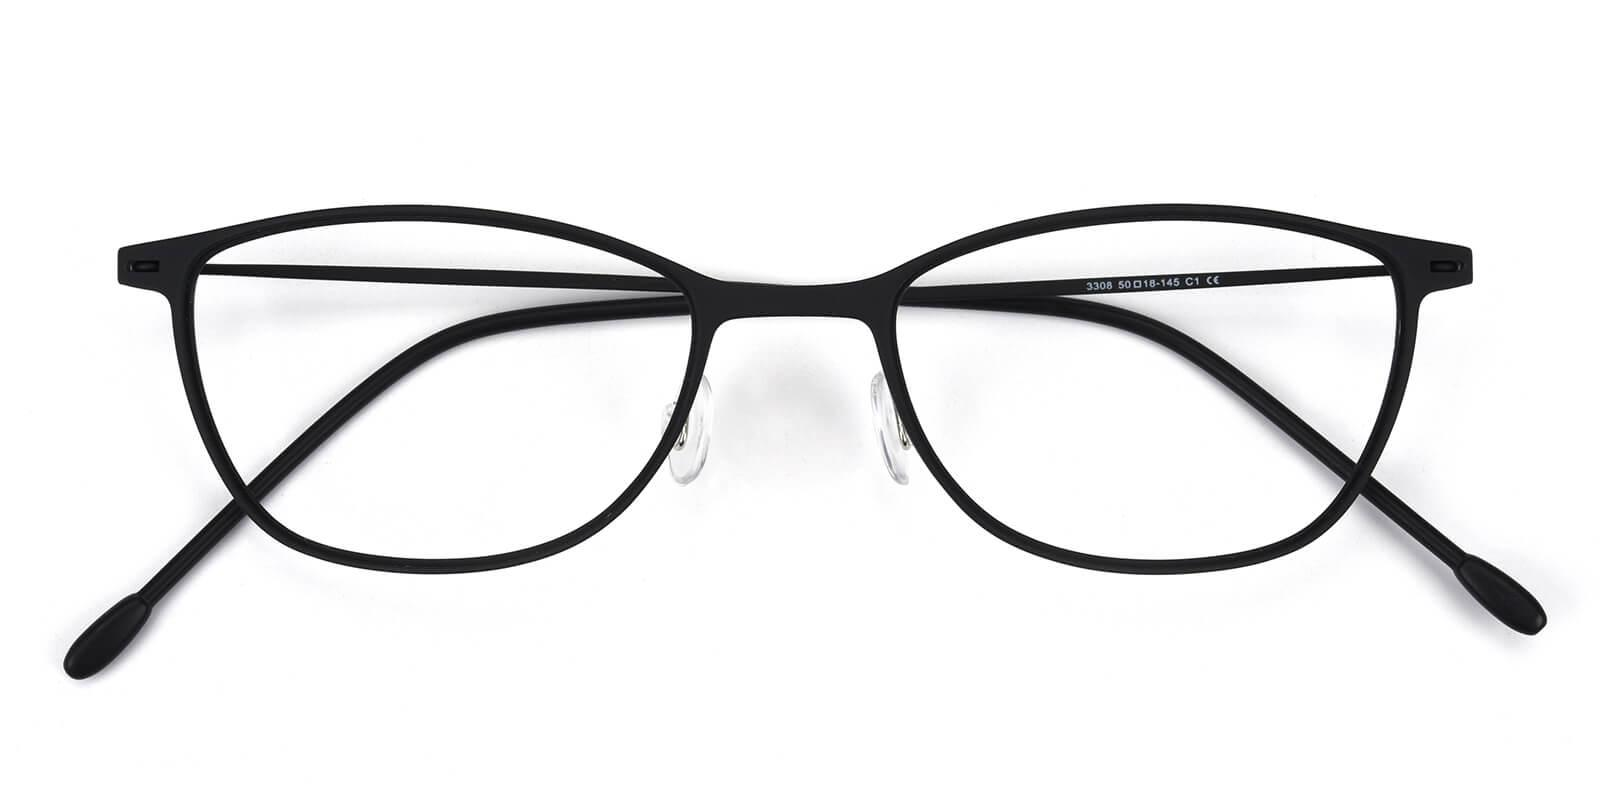 Pridgen-Black-Rectangle / Cat-Combination-Eyeglasses-detail